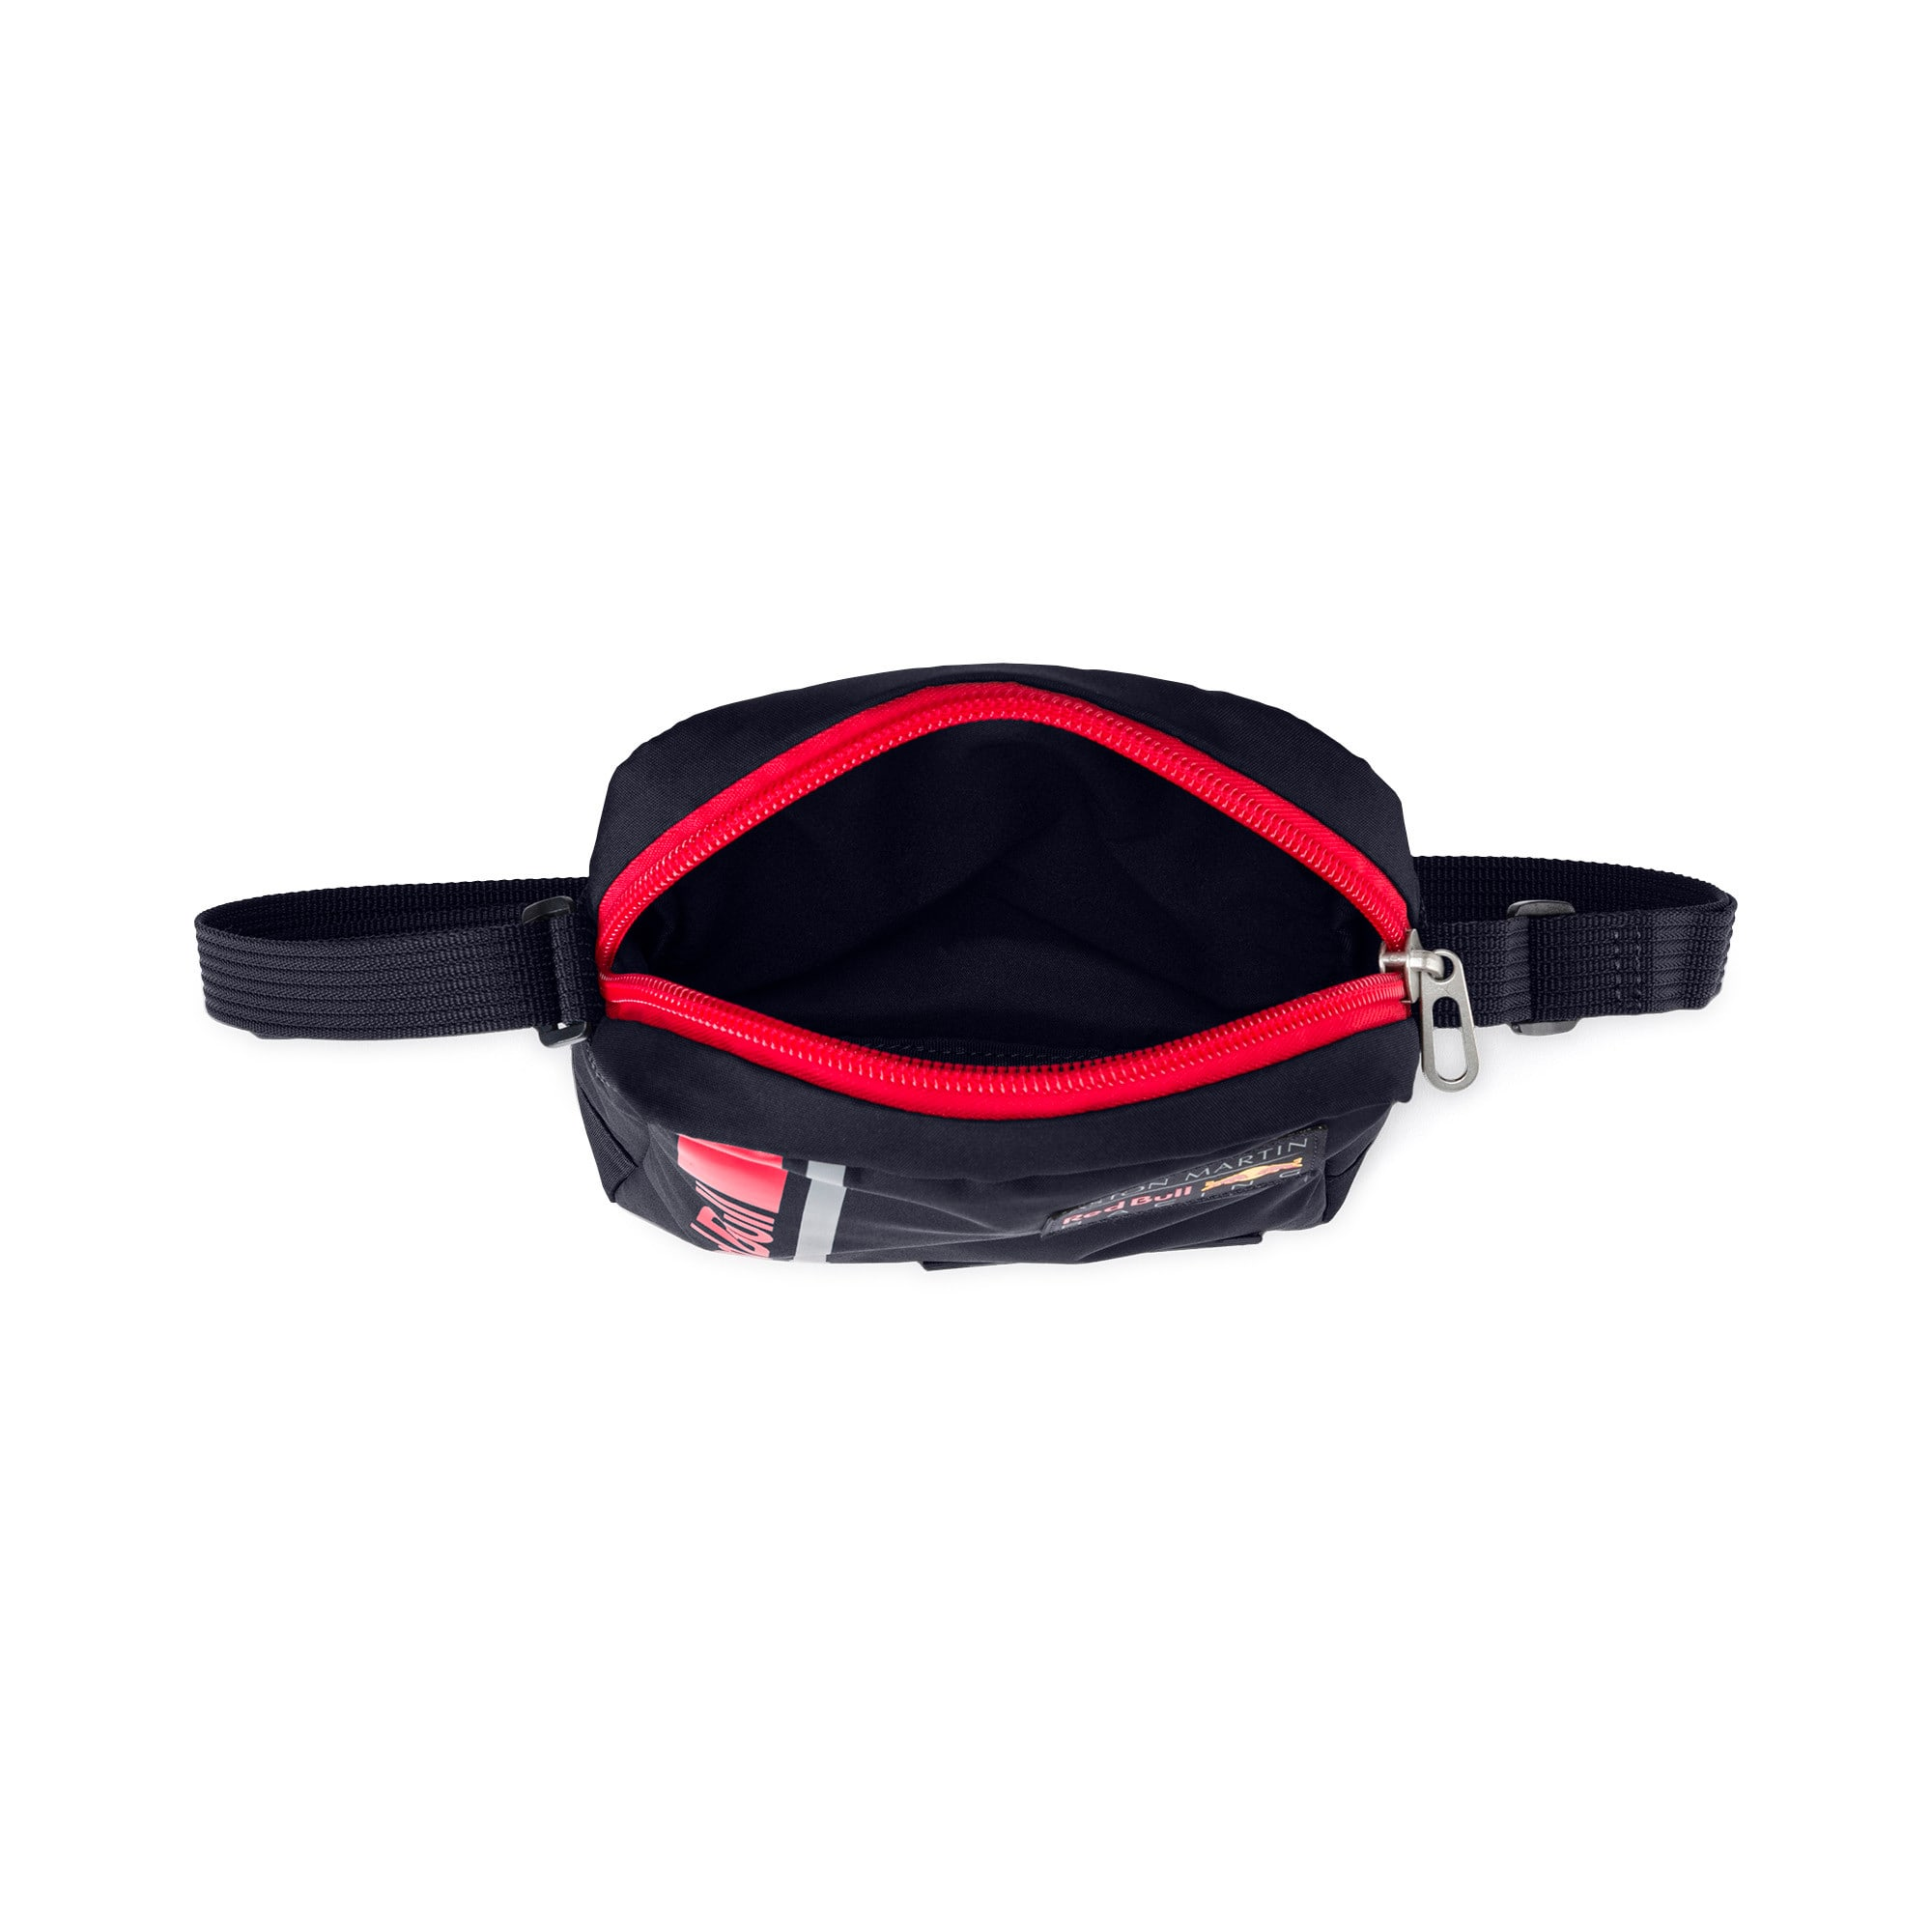 Thumbnail 3 of AM Red Bull Racing Replica Portable Bag, NIGHT SKY, medium